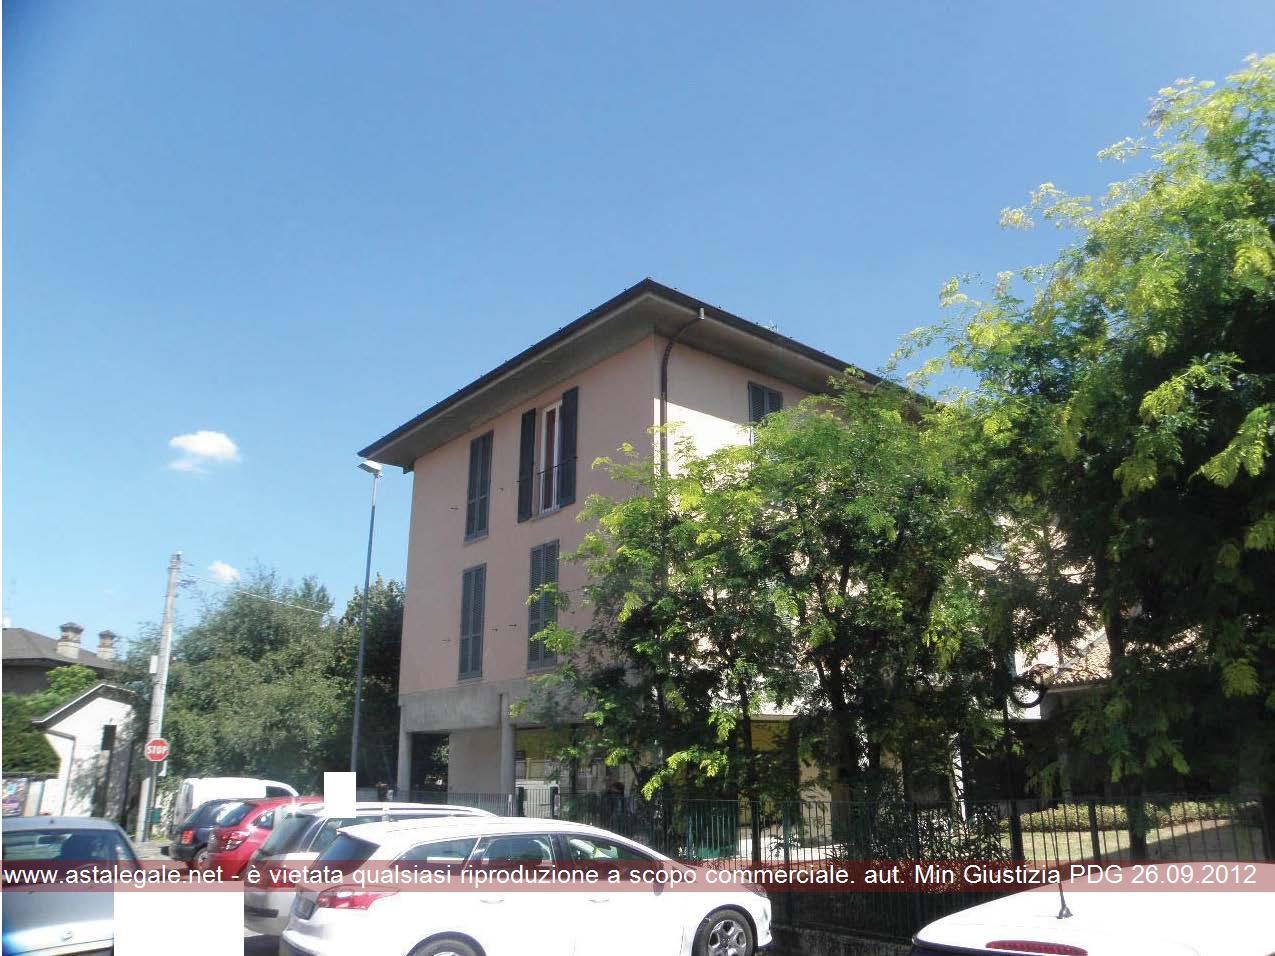 Carate Brianza (MB) Via Amedeo Colombo 1